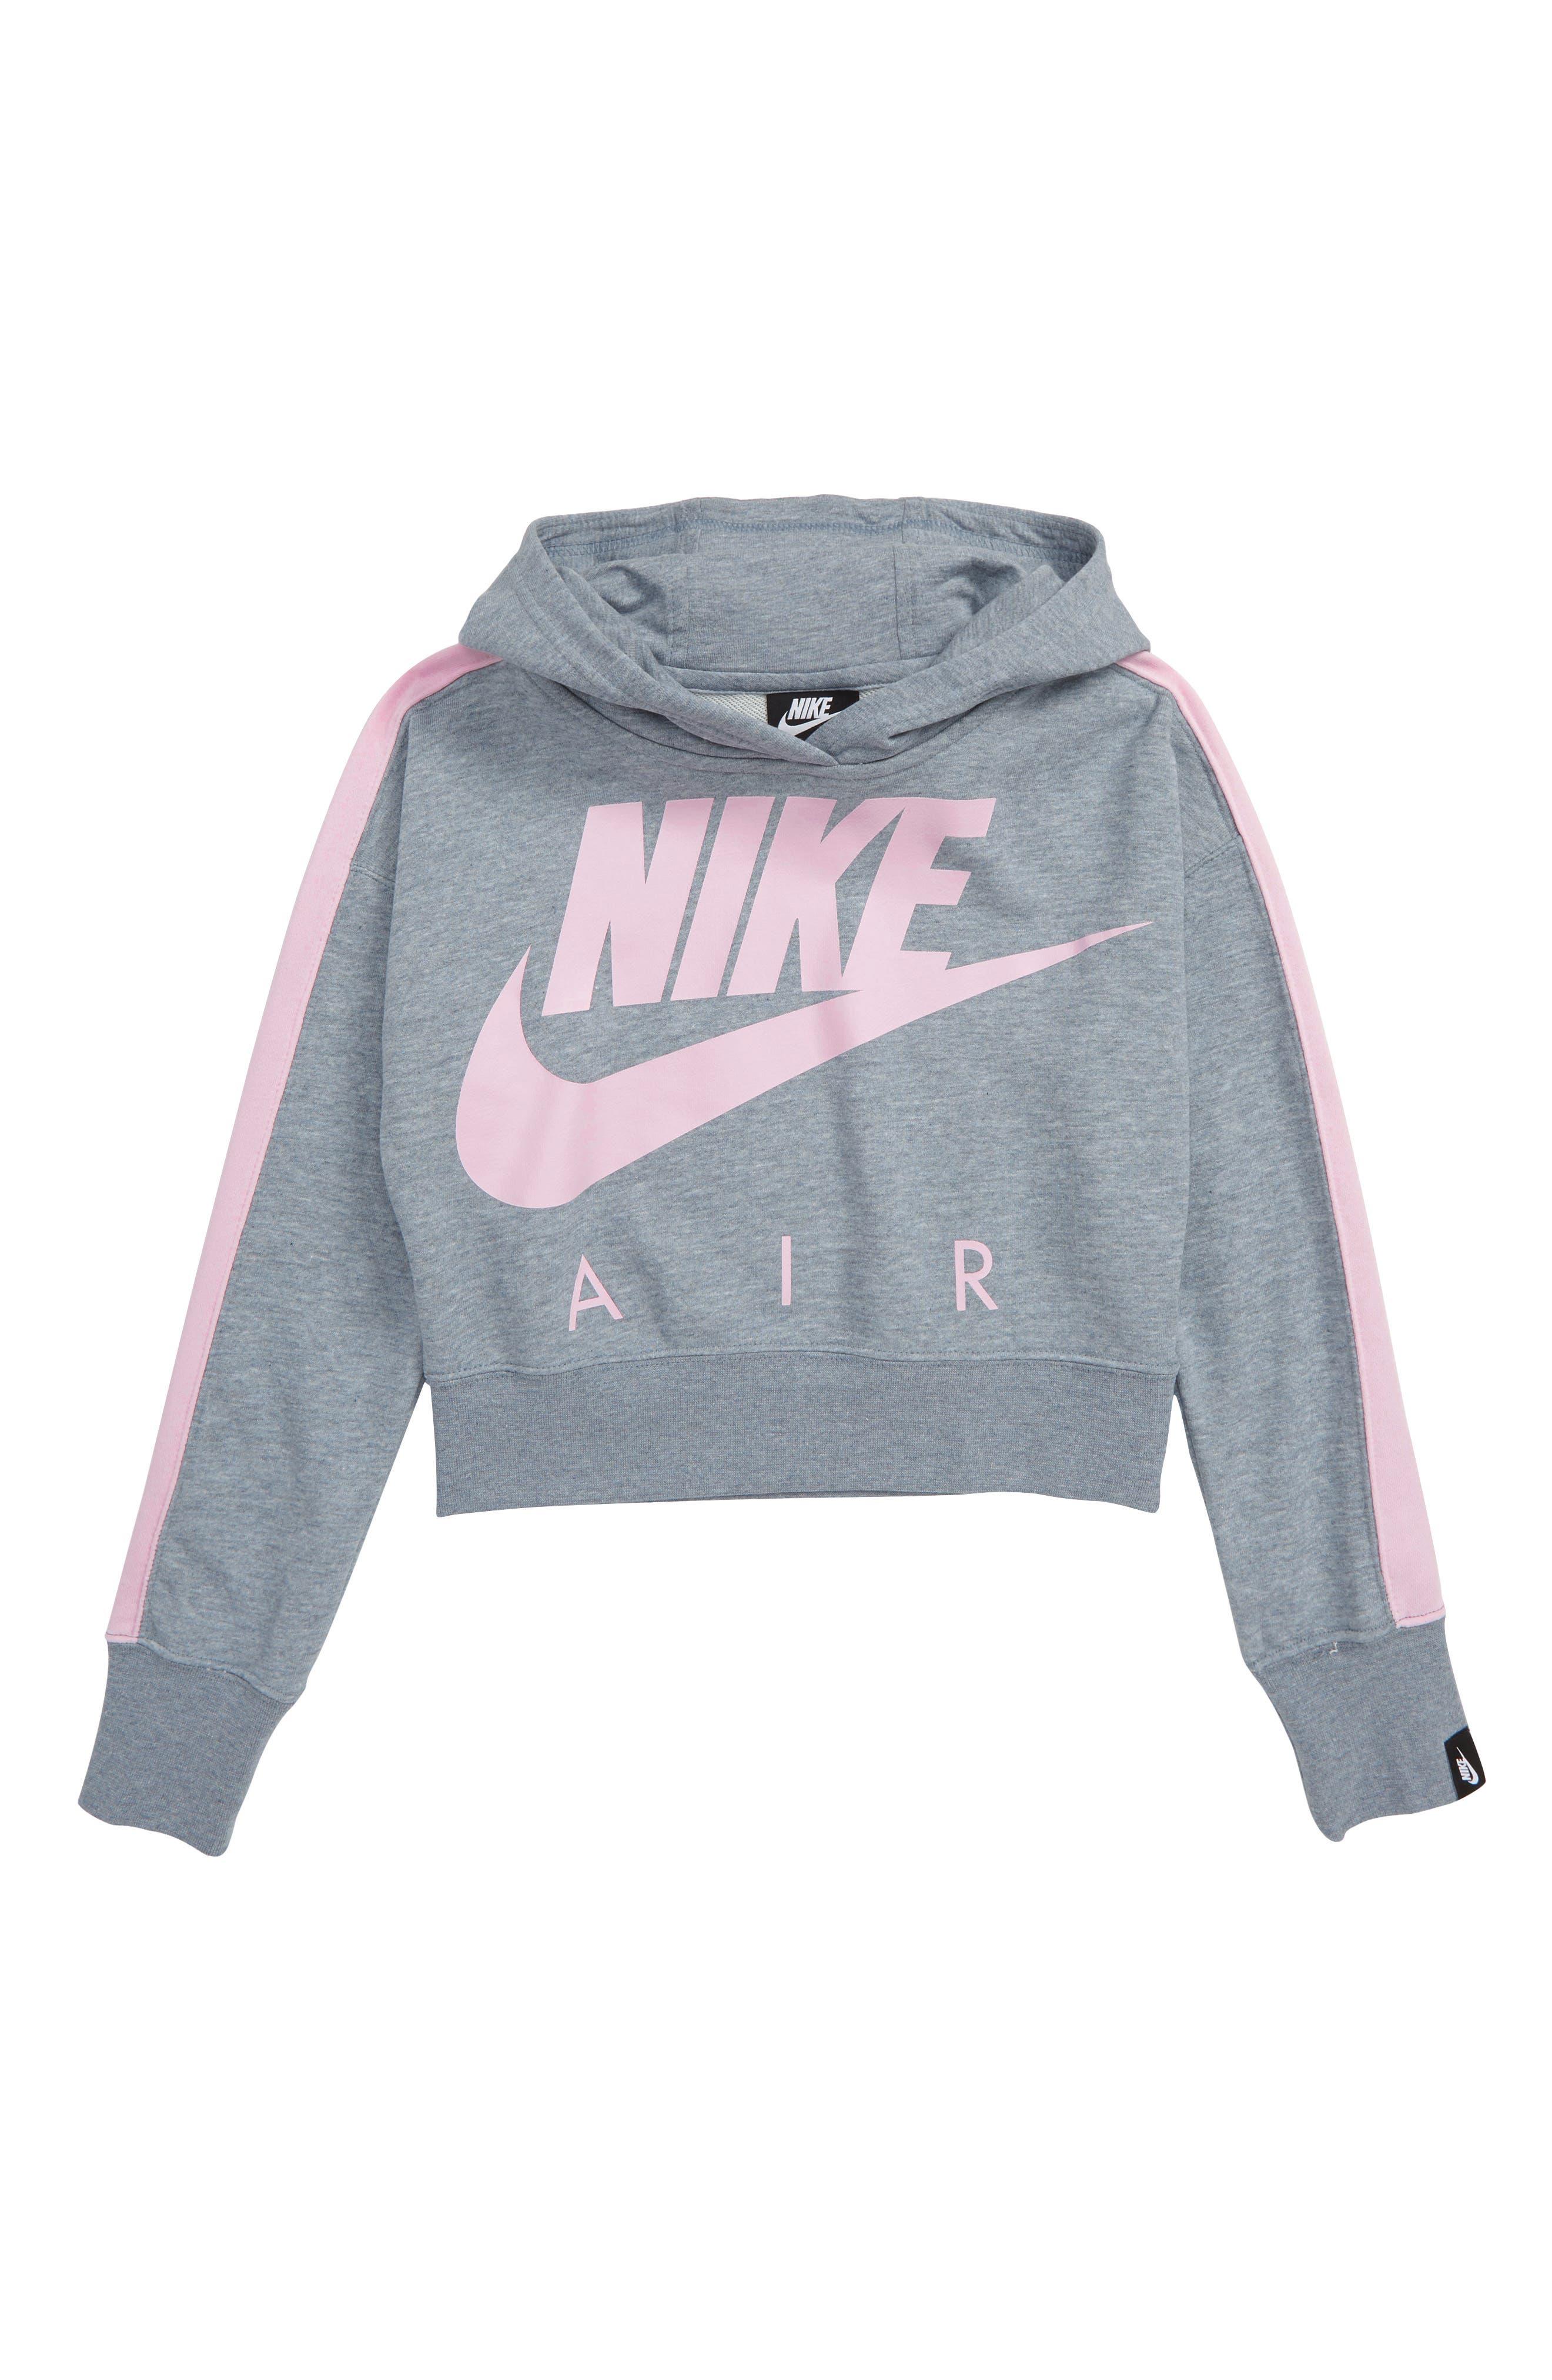 NIKE Air Logo Crop Sweatshirt, Main, color, ASHEN SLATE/ HEATHER/ PINK